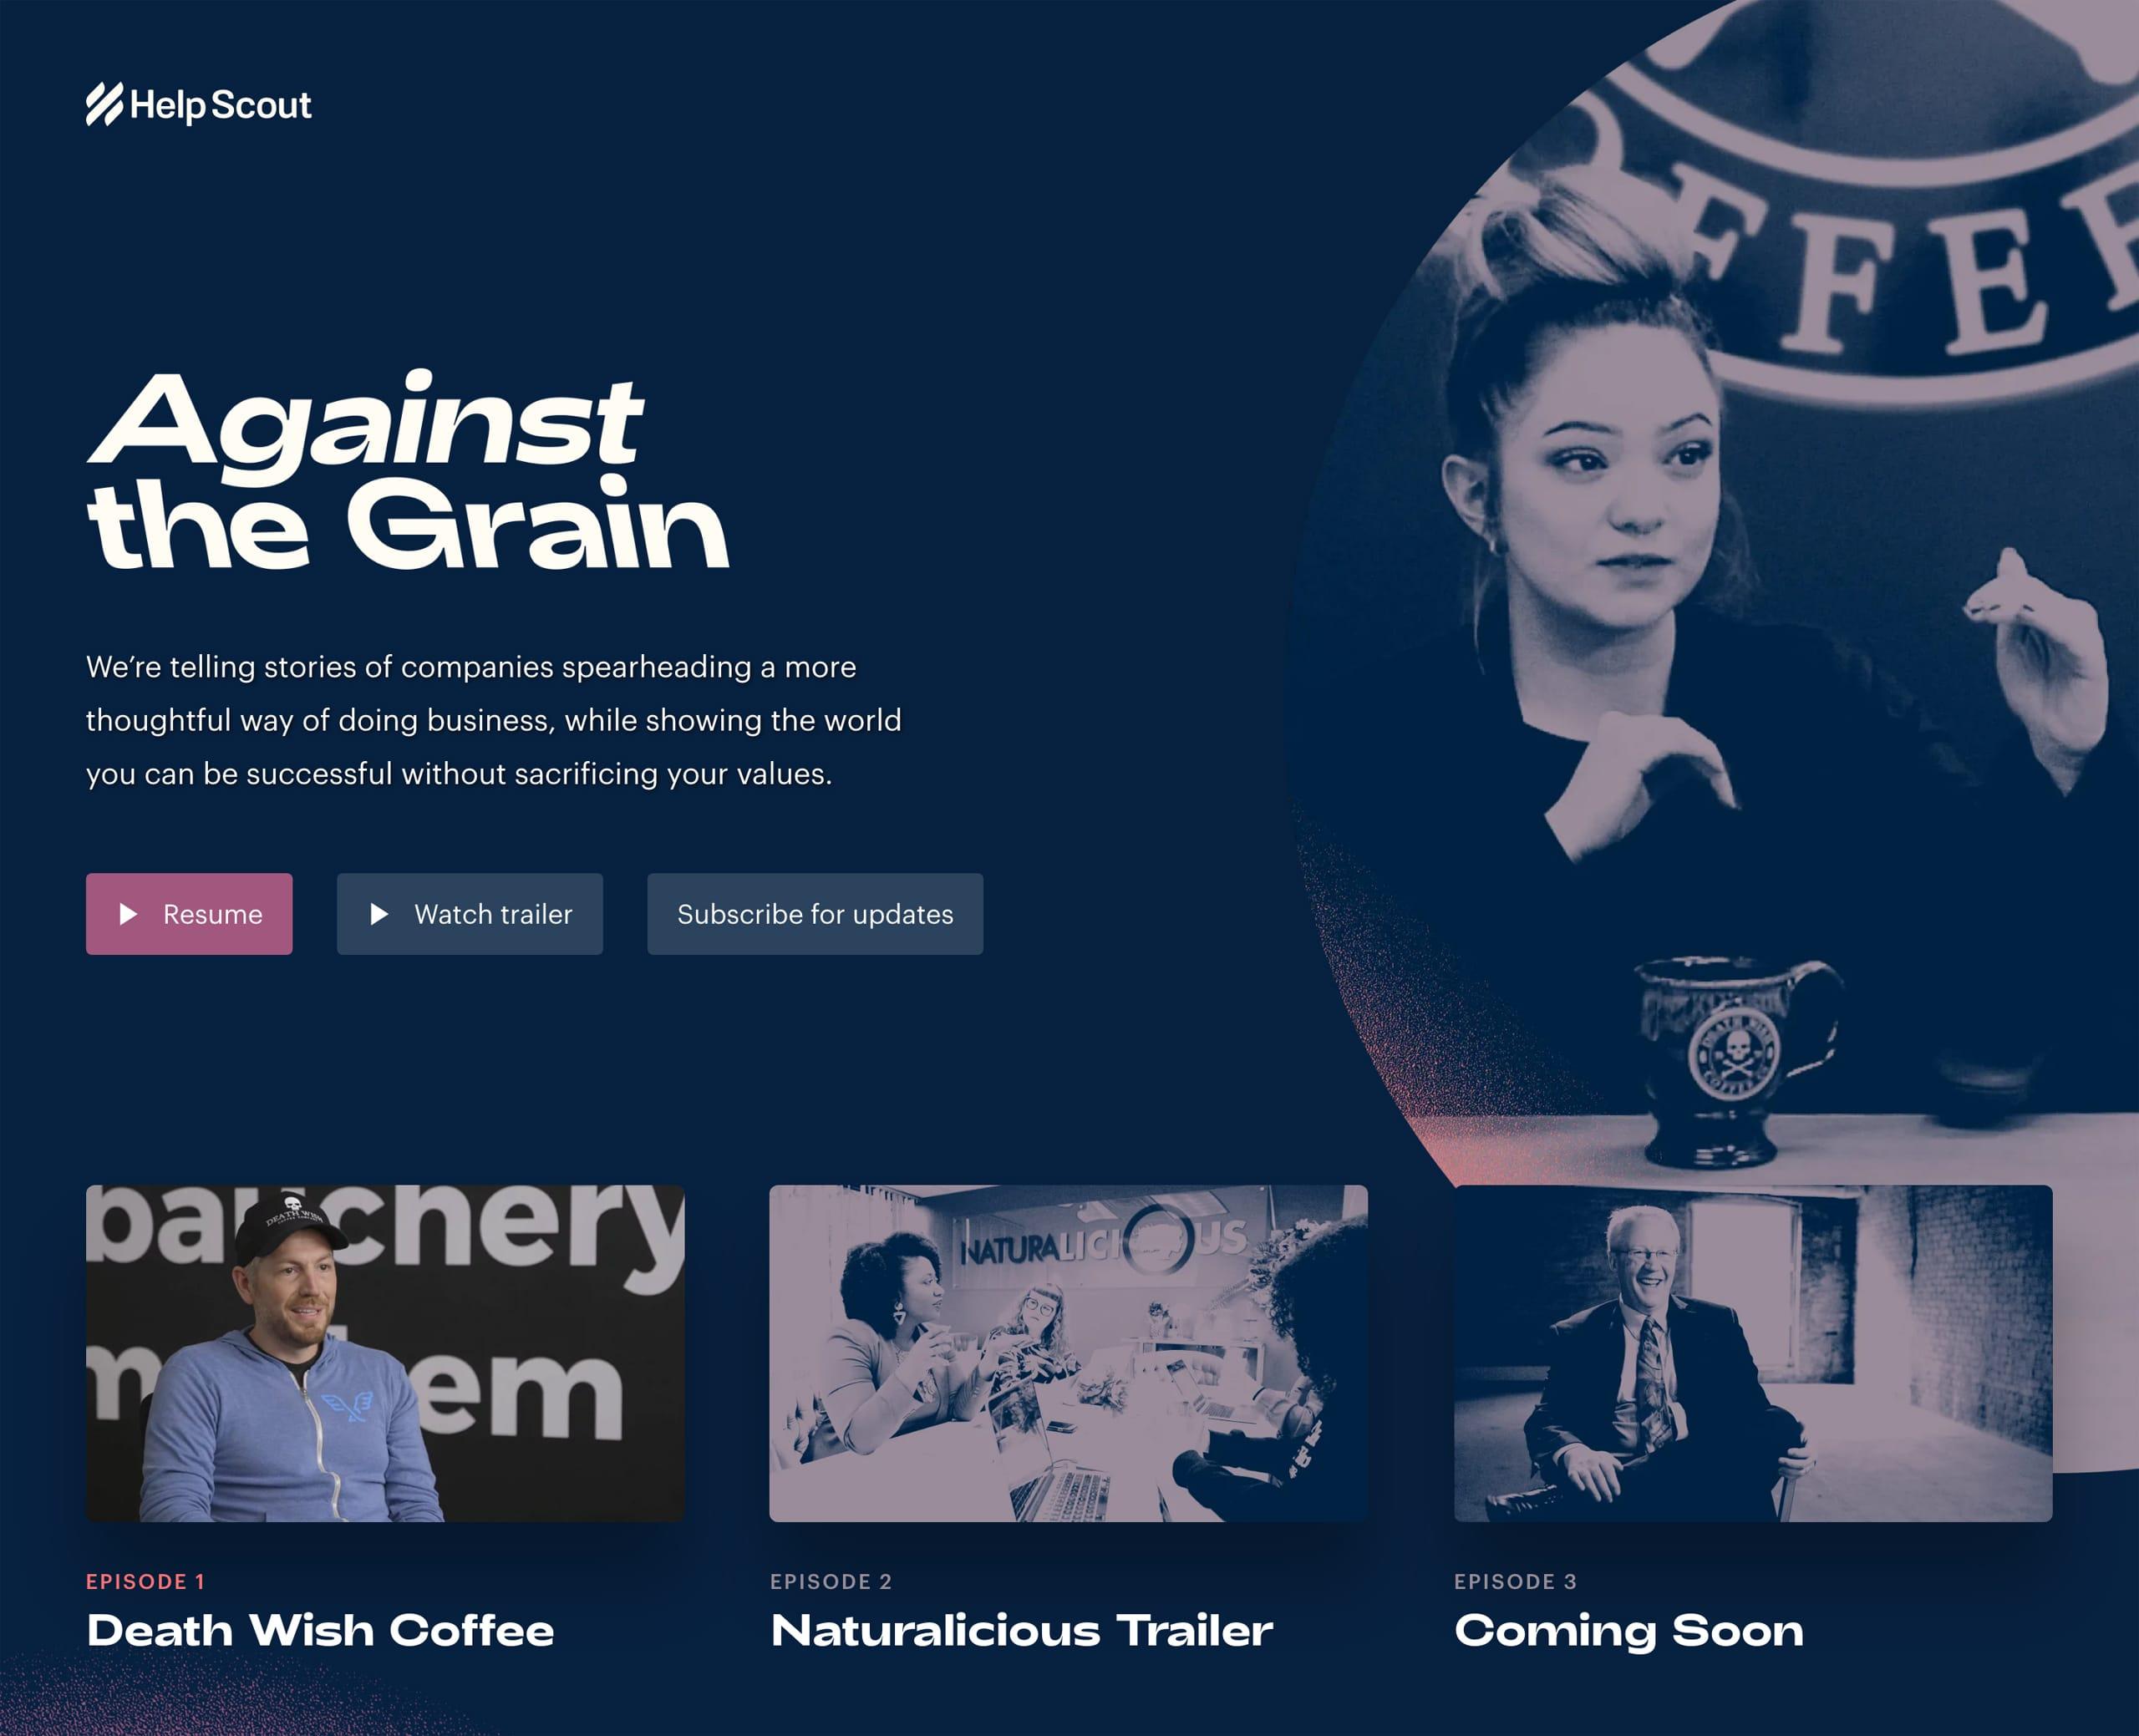 Against The Grain Website Screenshot